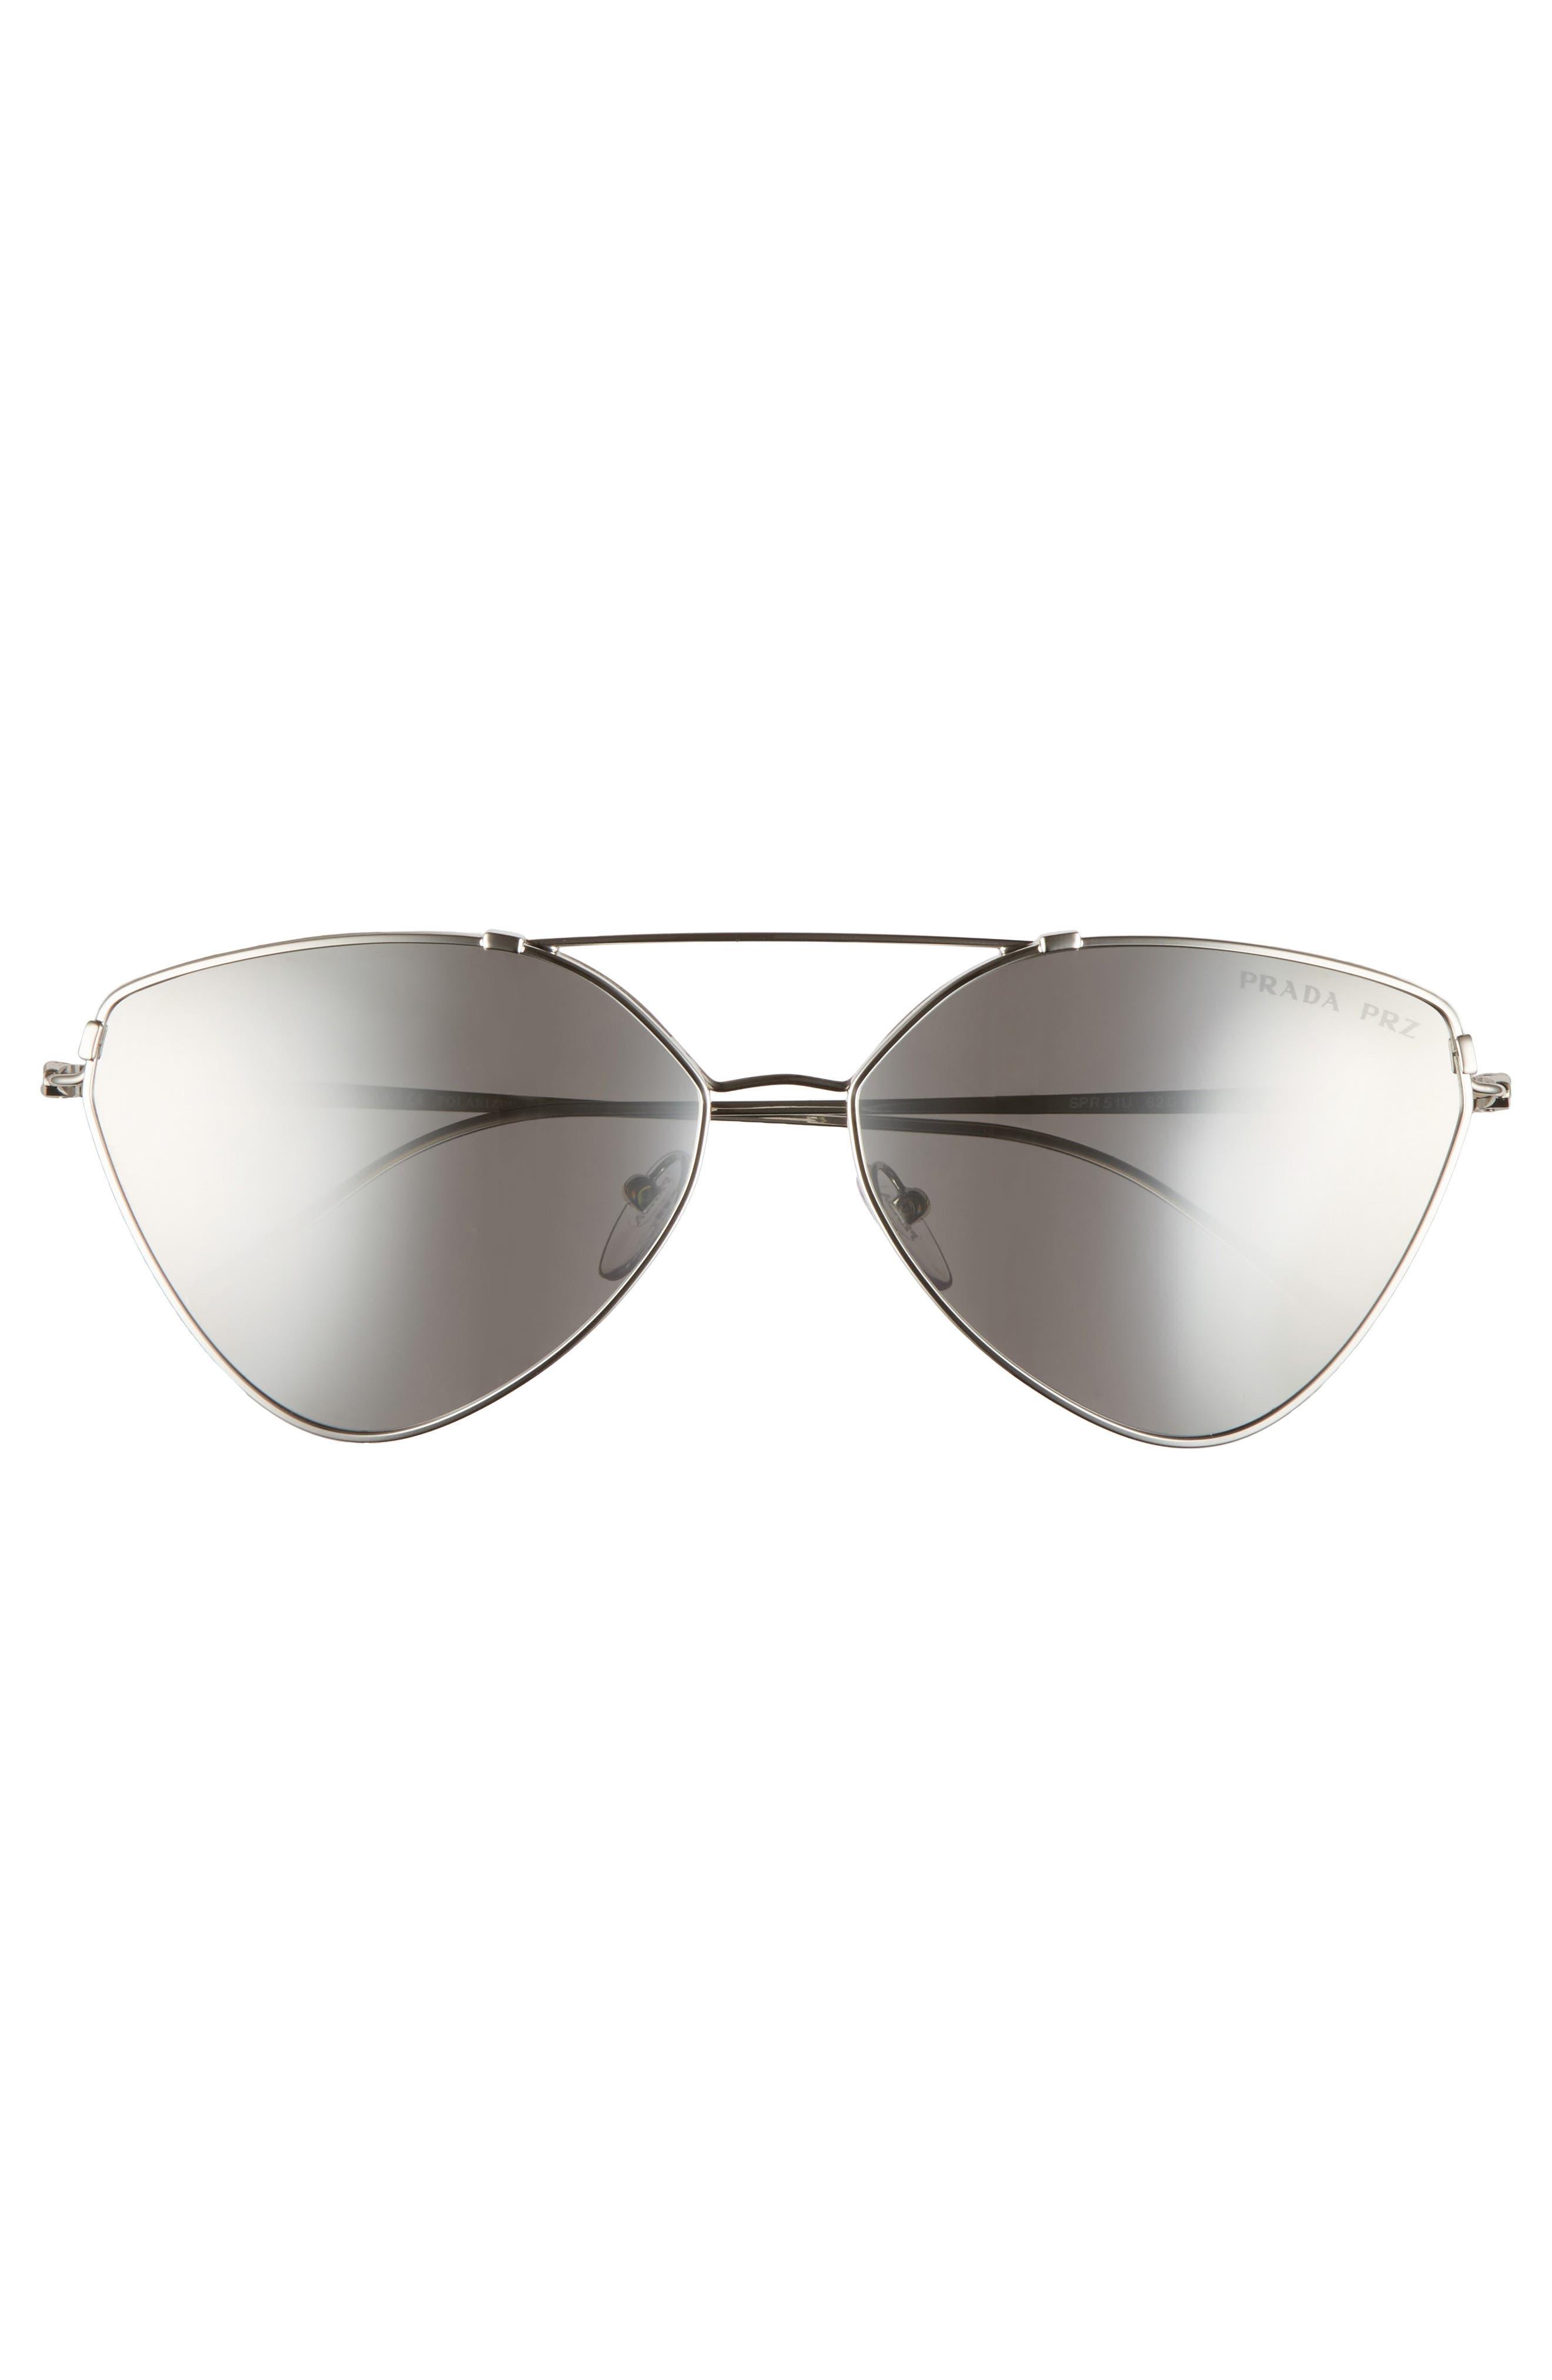 62mm Polarized Oversize Aviator Sunglasses,                             Alternate thumbnail 4, color,                             042